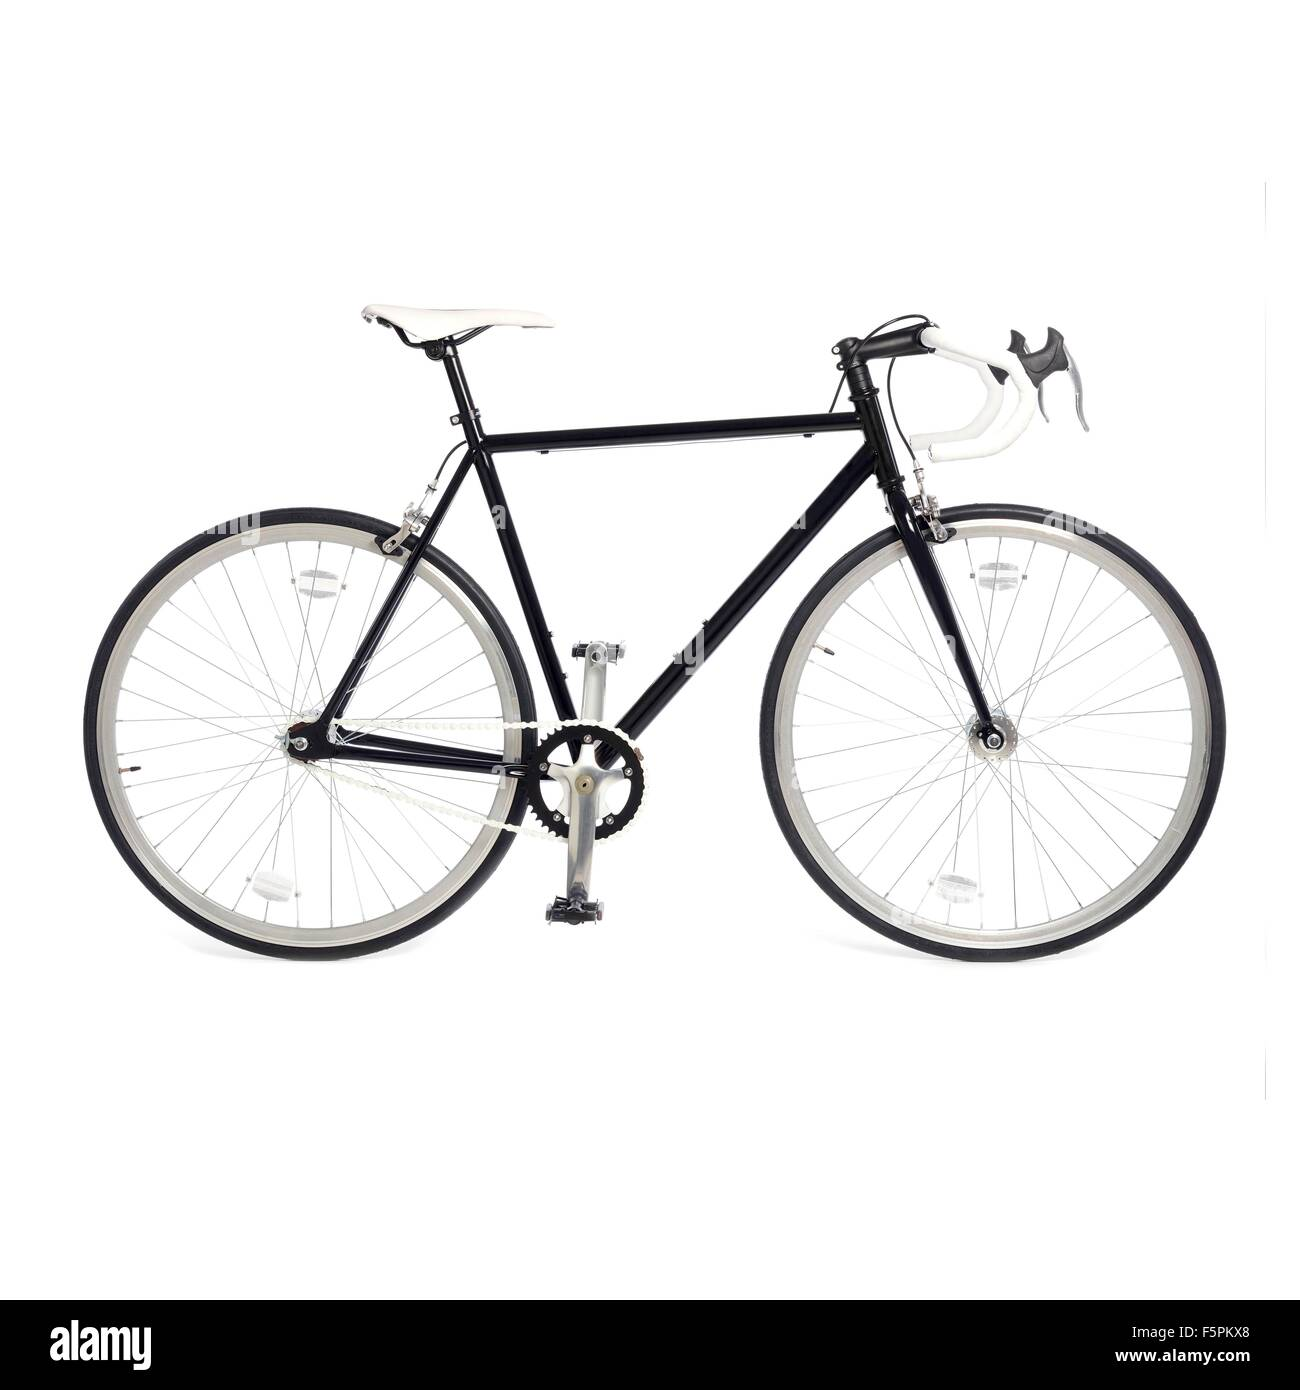 Bicicleta de carretera de piñón fijo contra un fondo blanco. Imagen De Stock